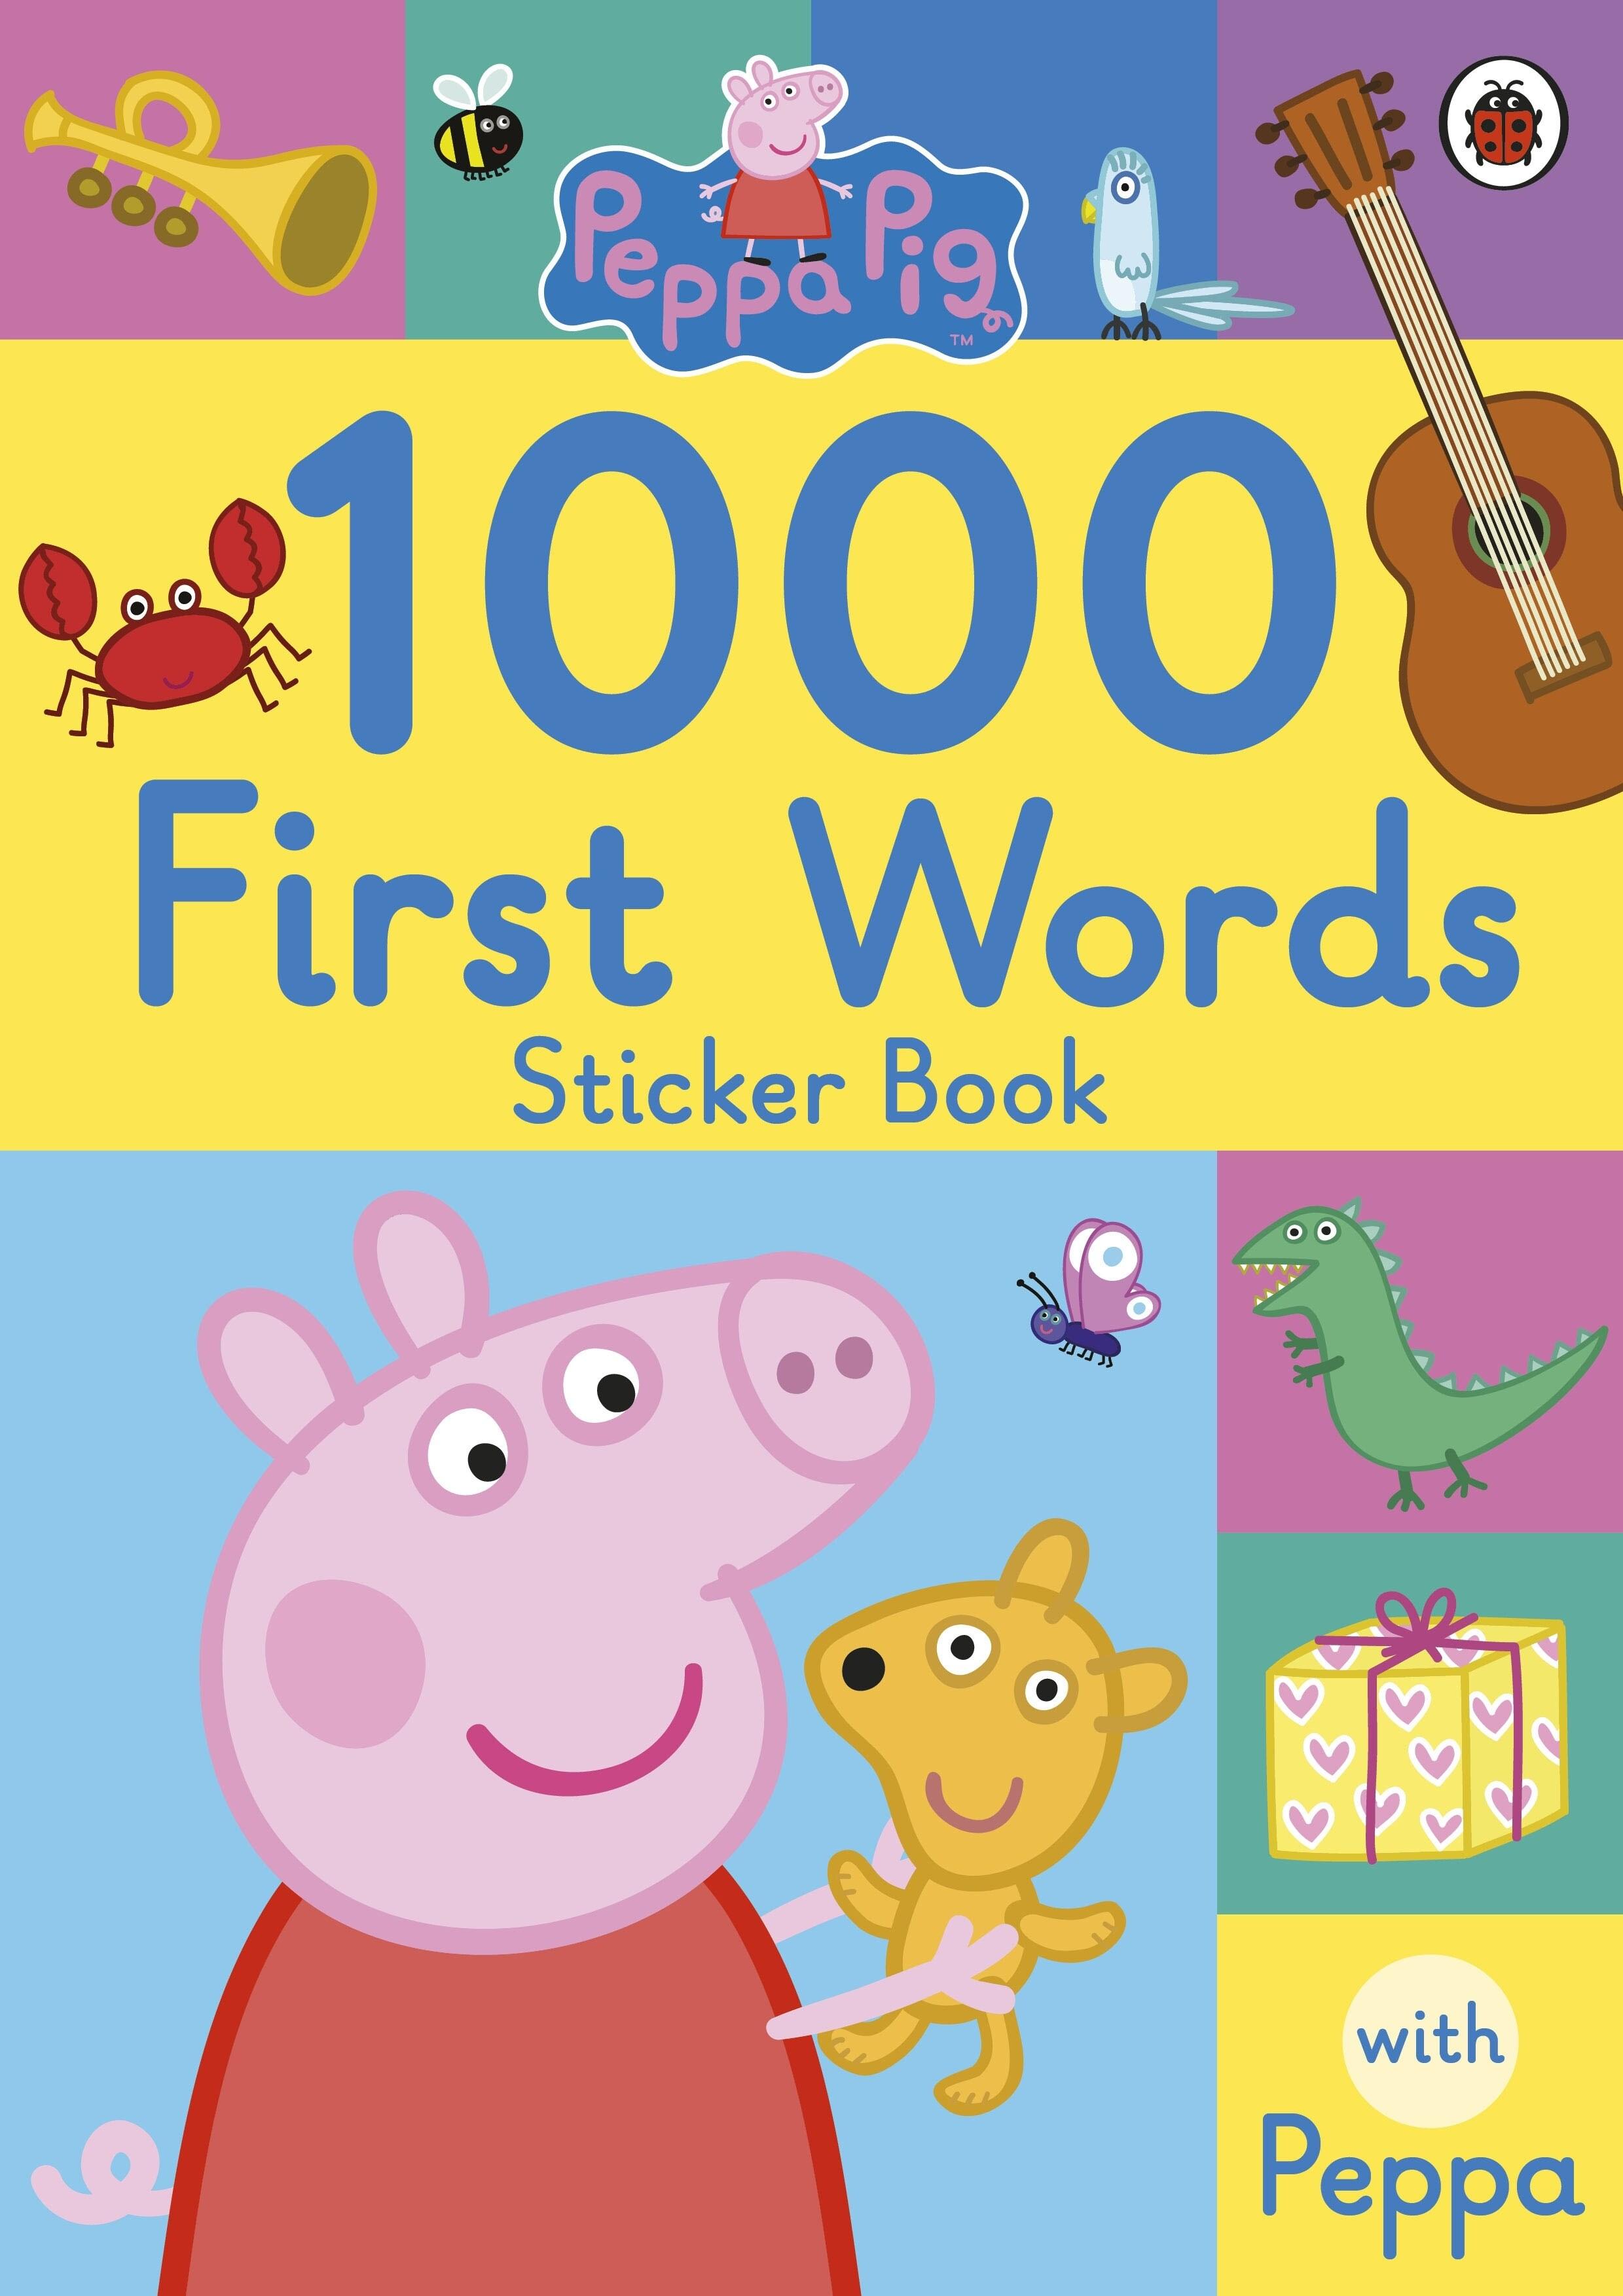 Peppa Pig: 1000 First Words Sticker Book (Paperback)